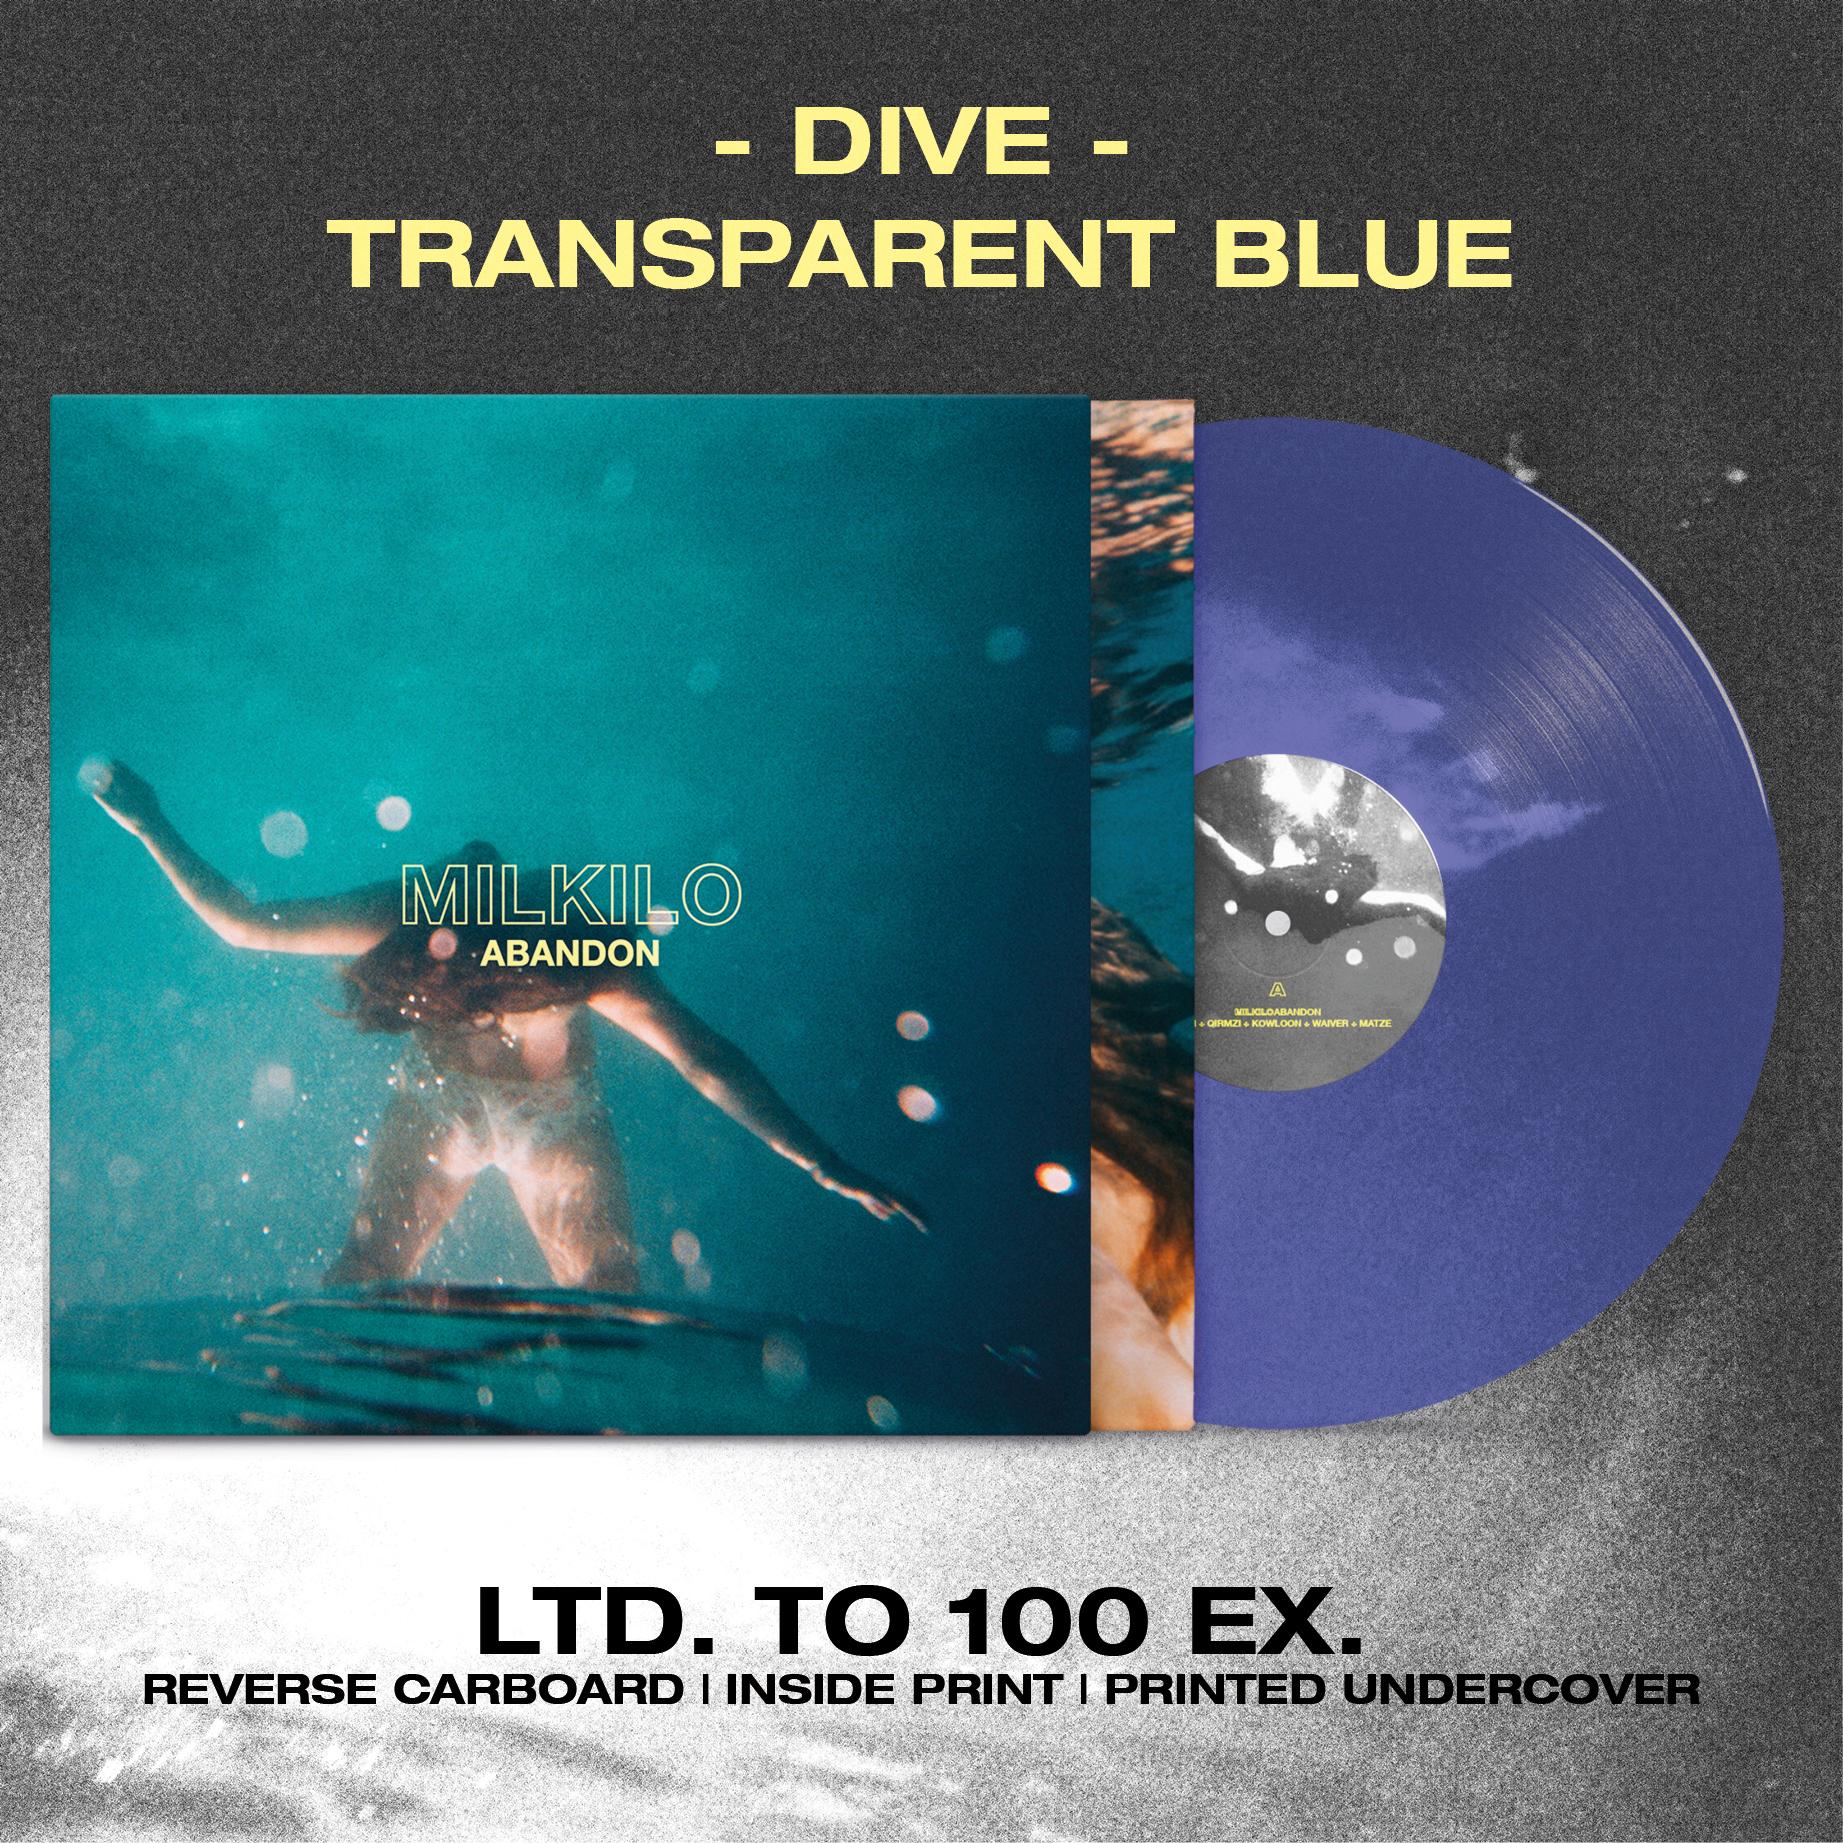 [VOX41] MILKILO - ABANDON [LP - CD - DIGITAL]